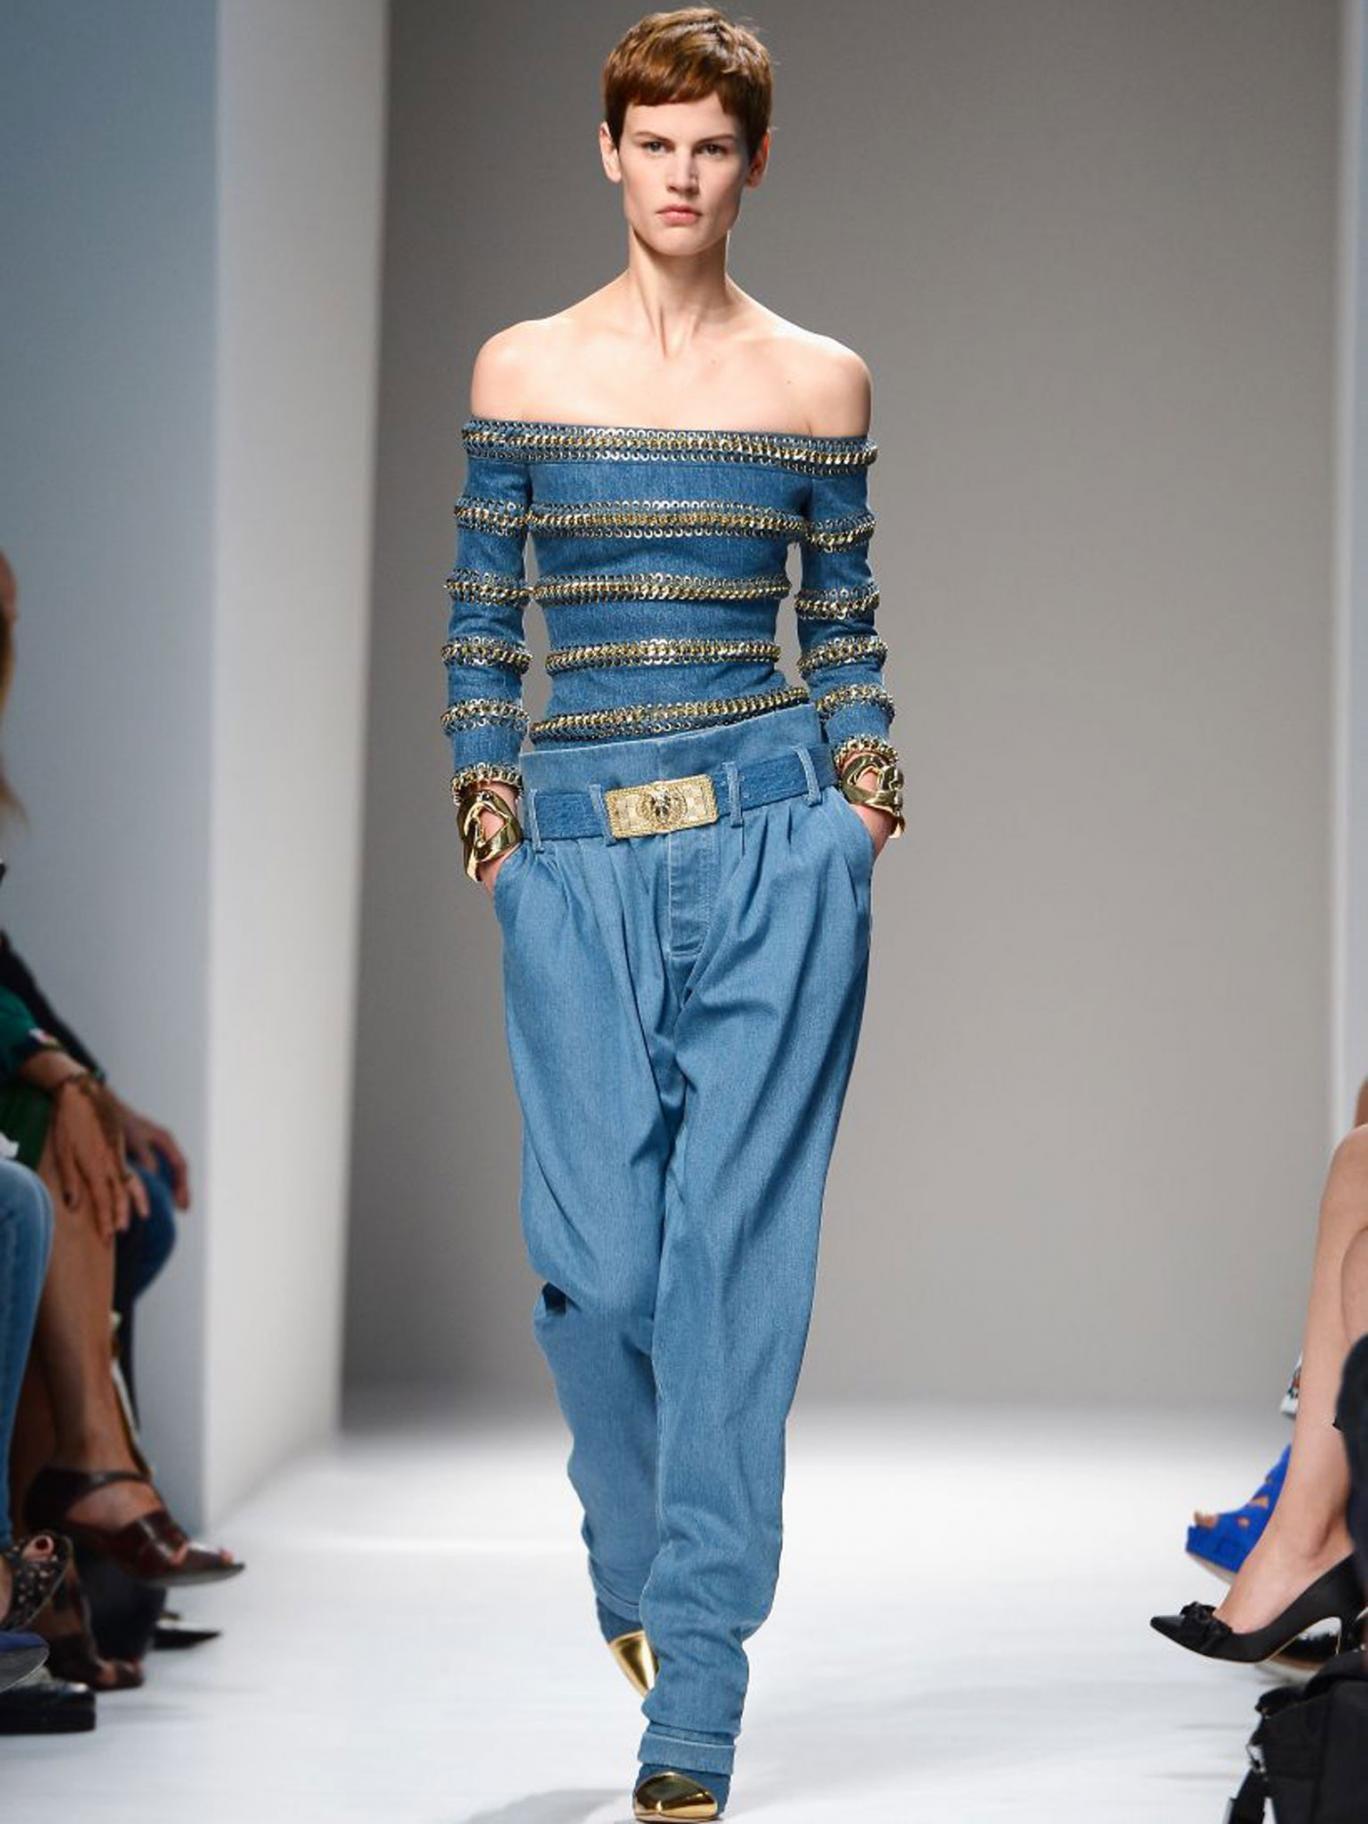 A model walks the runway during the Balmain show as part of the Paris Fashion Week Womenswear Spring/Summer 2013